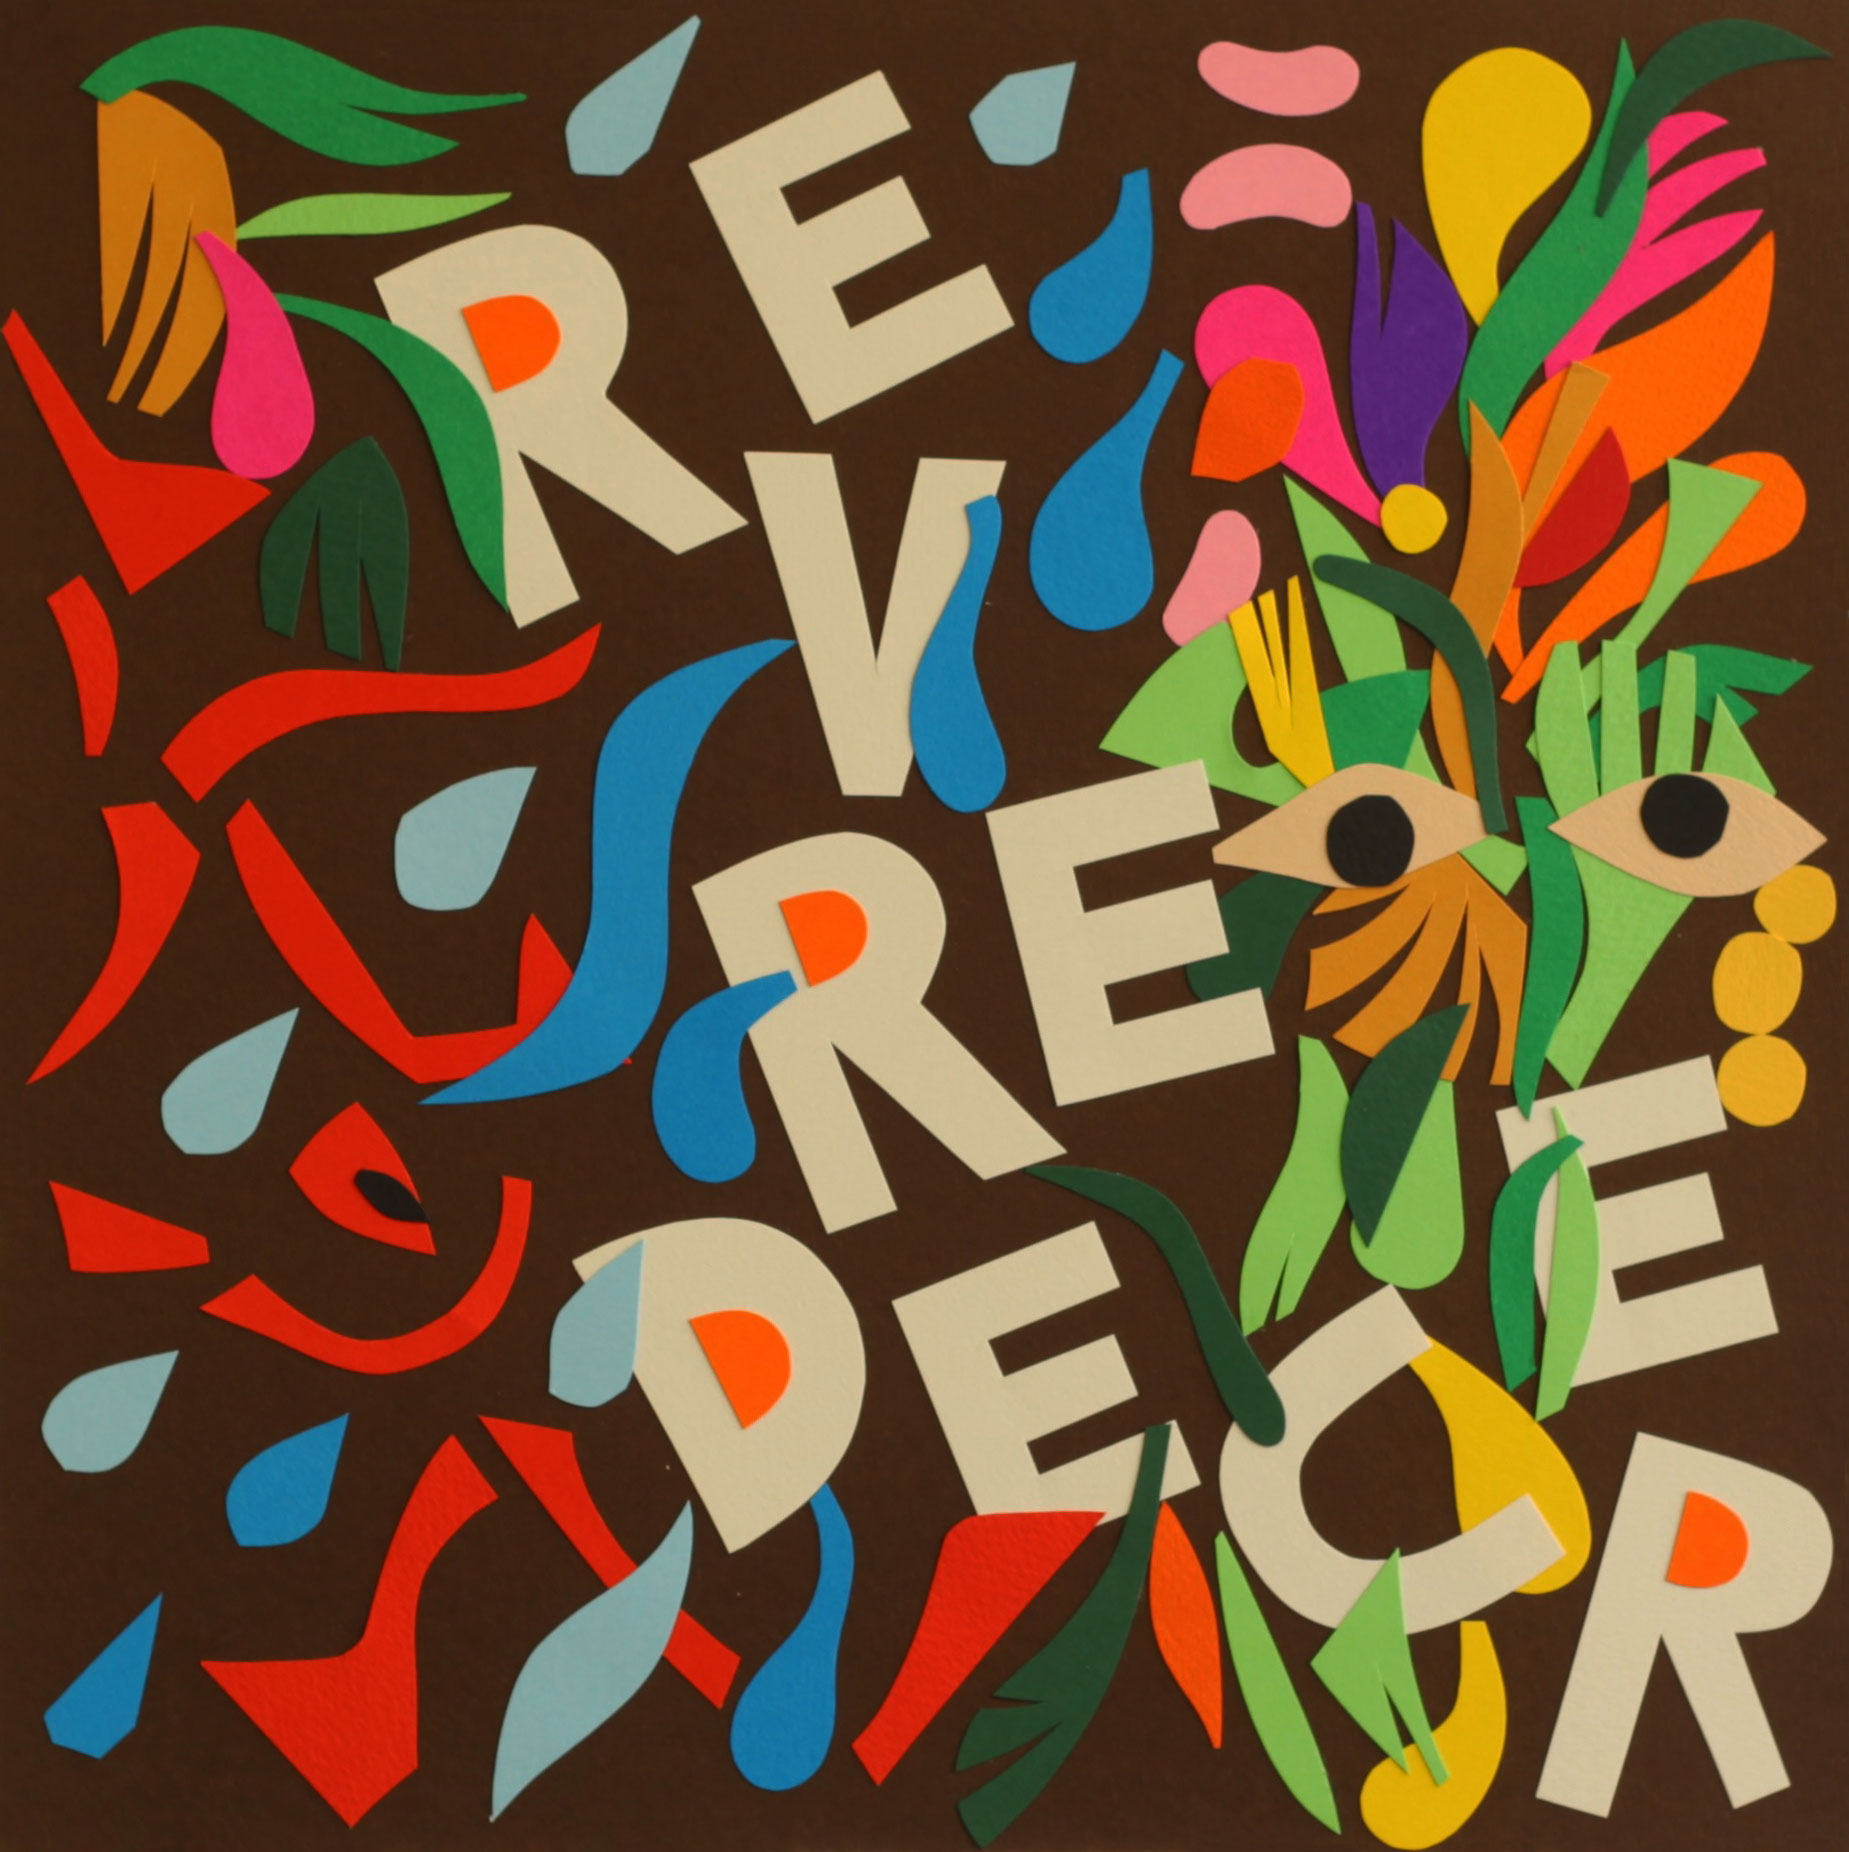 Reverdecer by Nadia Hernandez